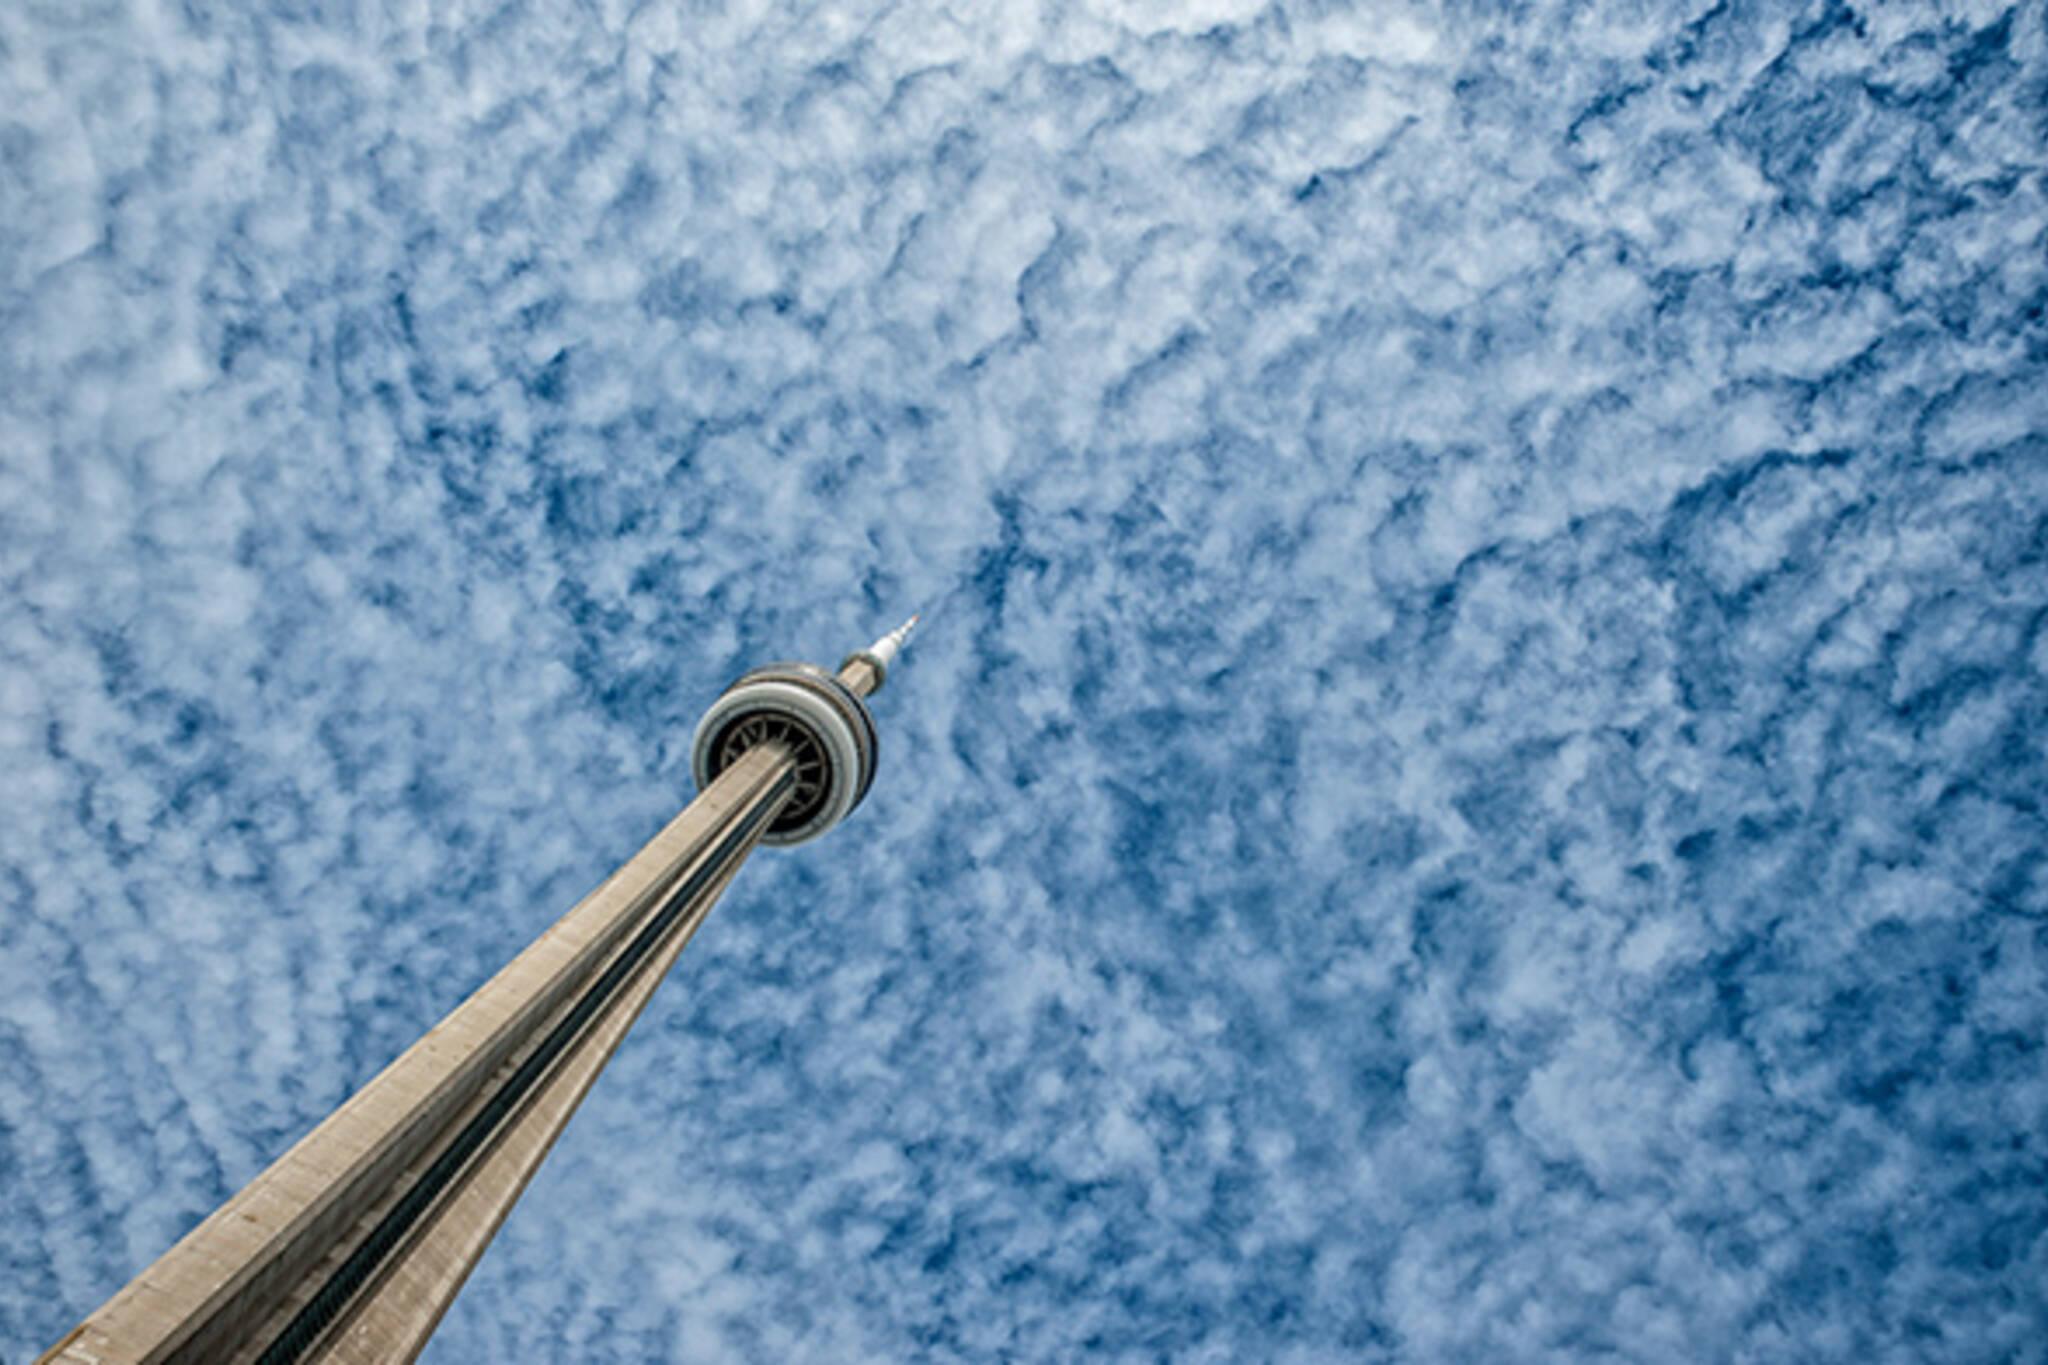 CN Tower sky